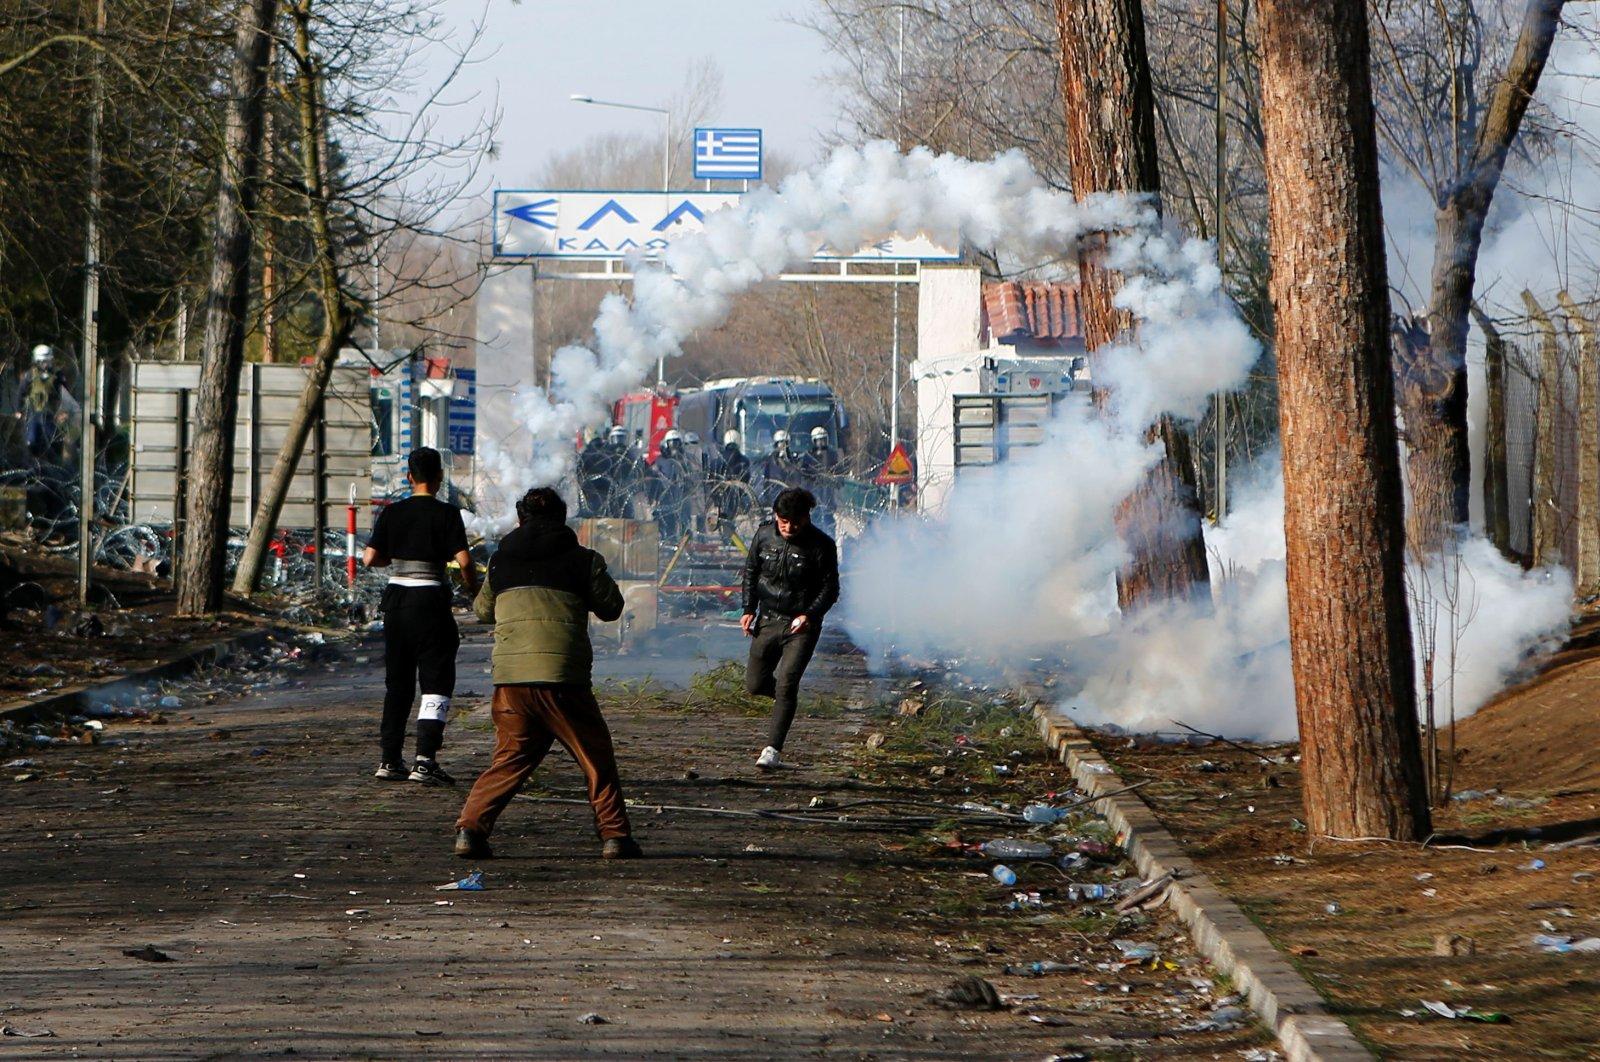 A migrant runs away from tear gas at Turkey's Pazarkule border crossing with Greece's Kastanies, near Edirne, Turkey, March 2, 2020. (REUTERS)